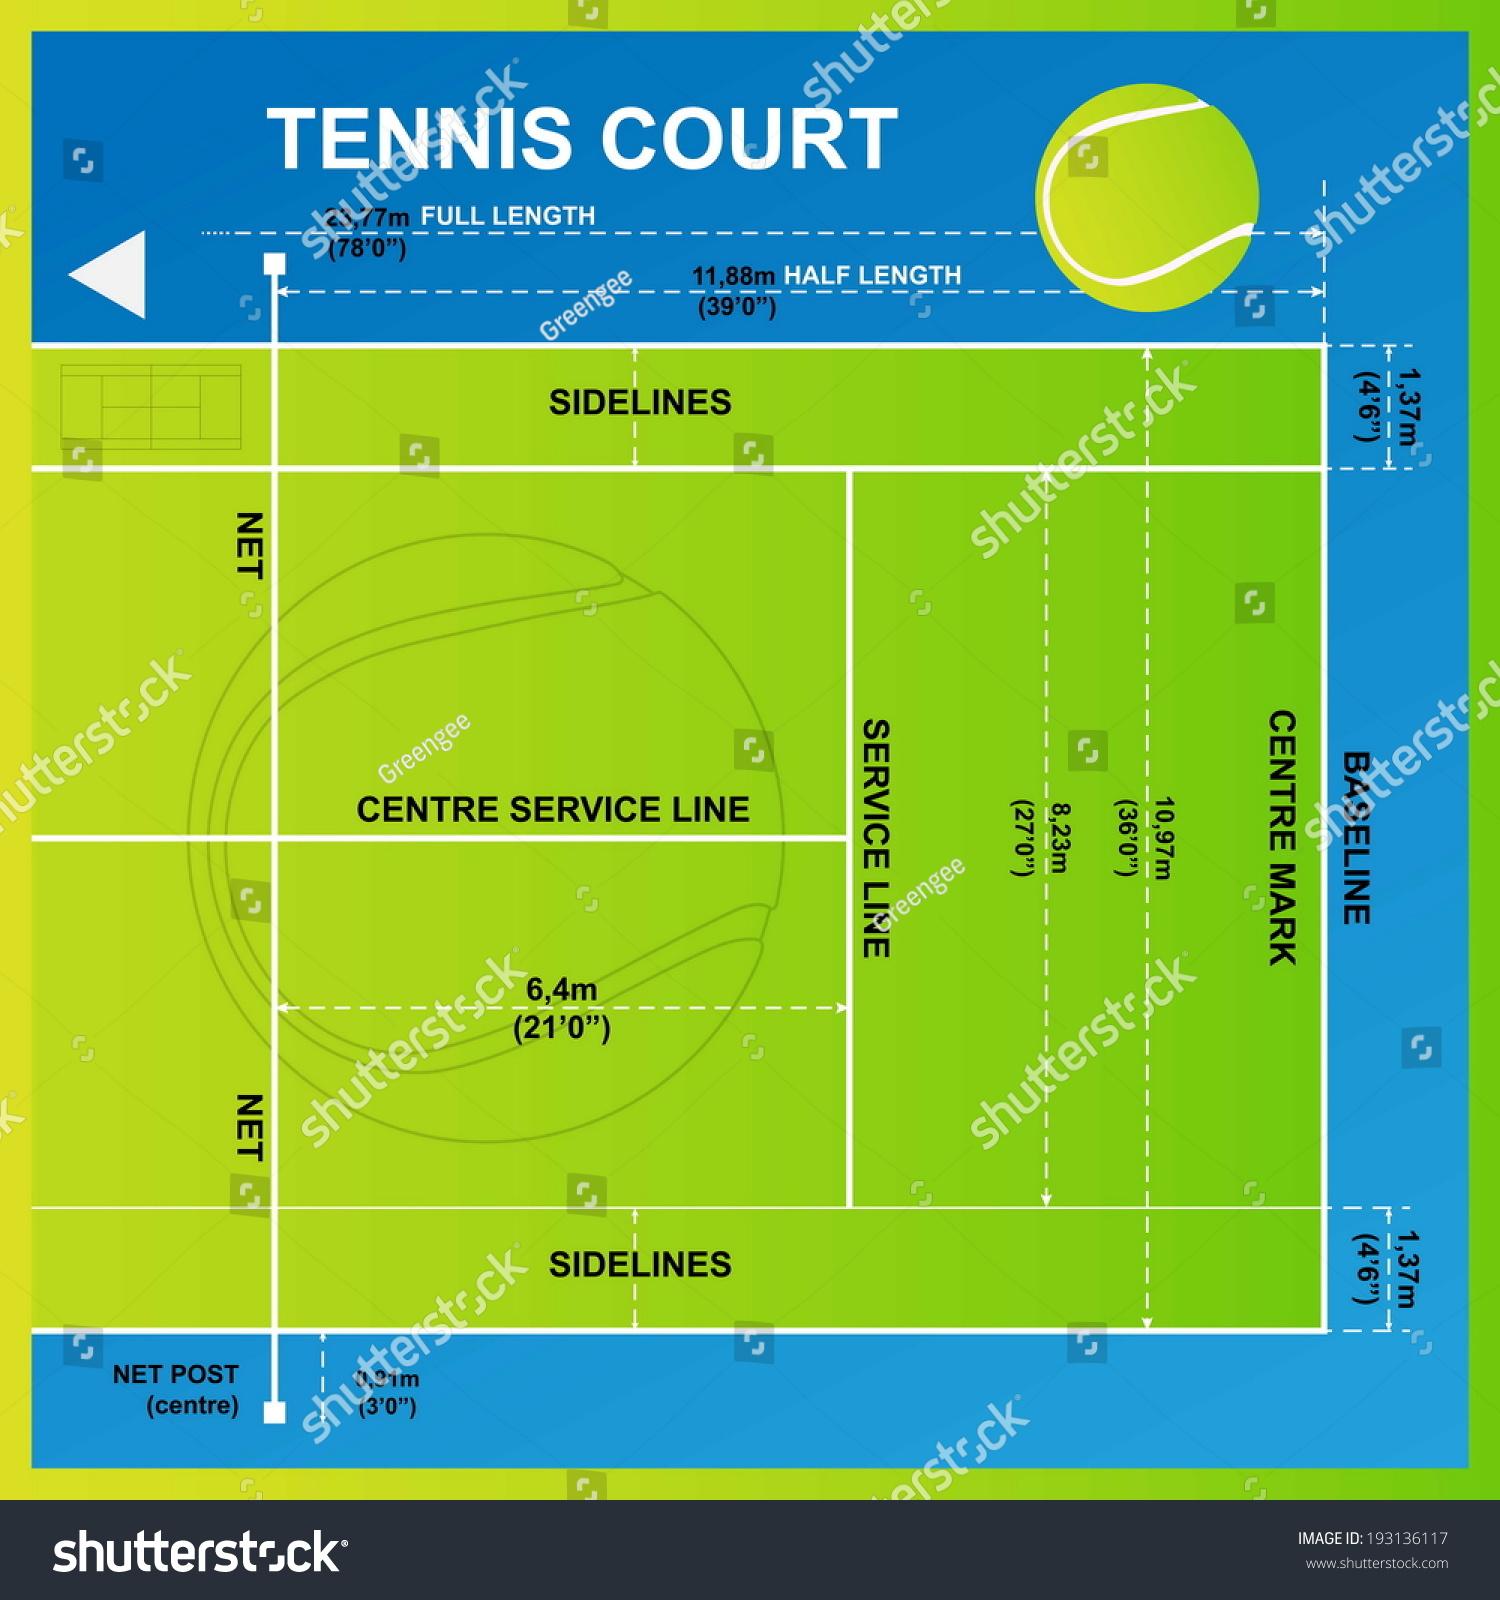 Tennis Court Yard Diagram Vector Stock-Vektorgrafik 193136117 ...